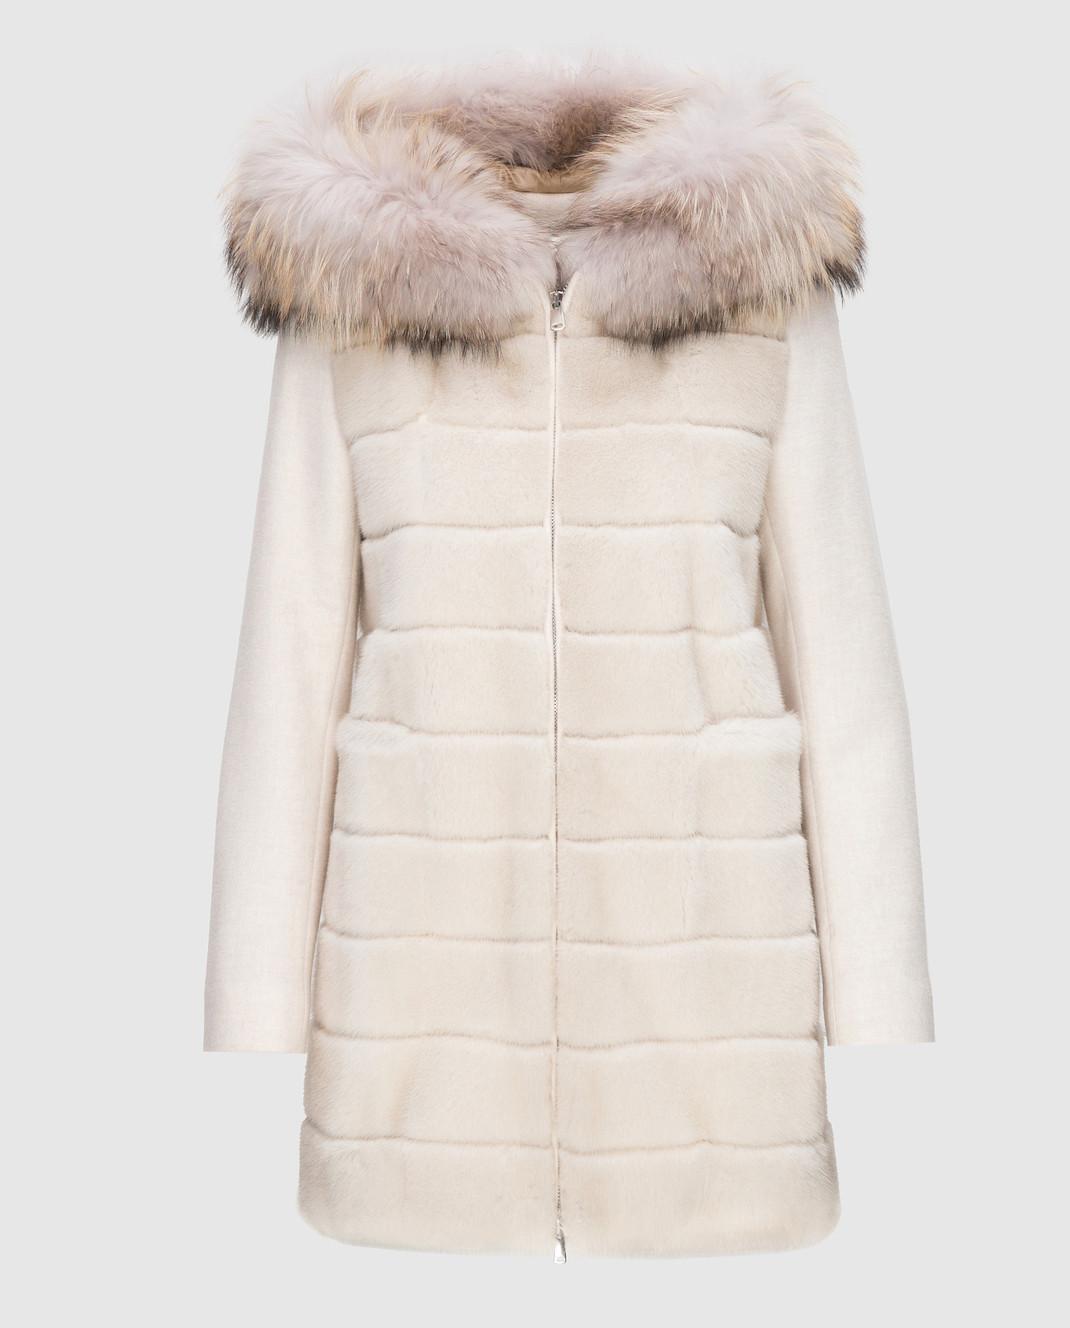 Real Furs House Светло-бежевое пальто с мехом енота 922RFH